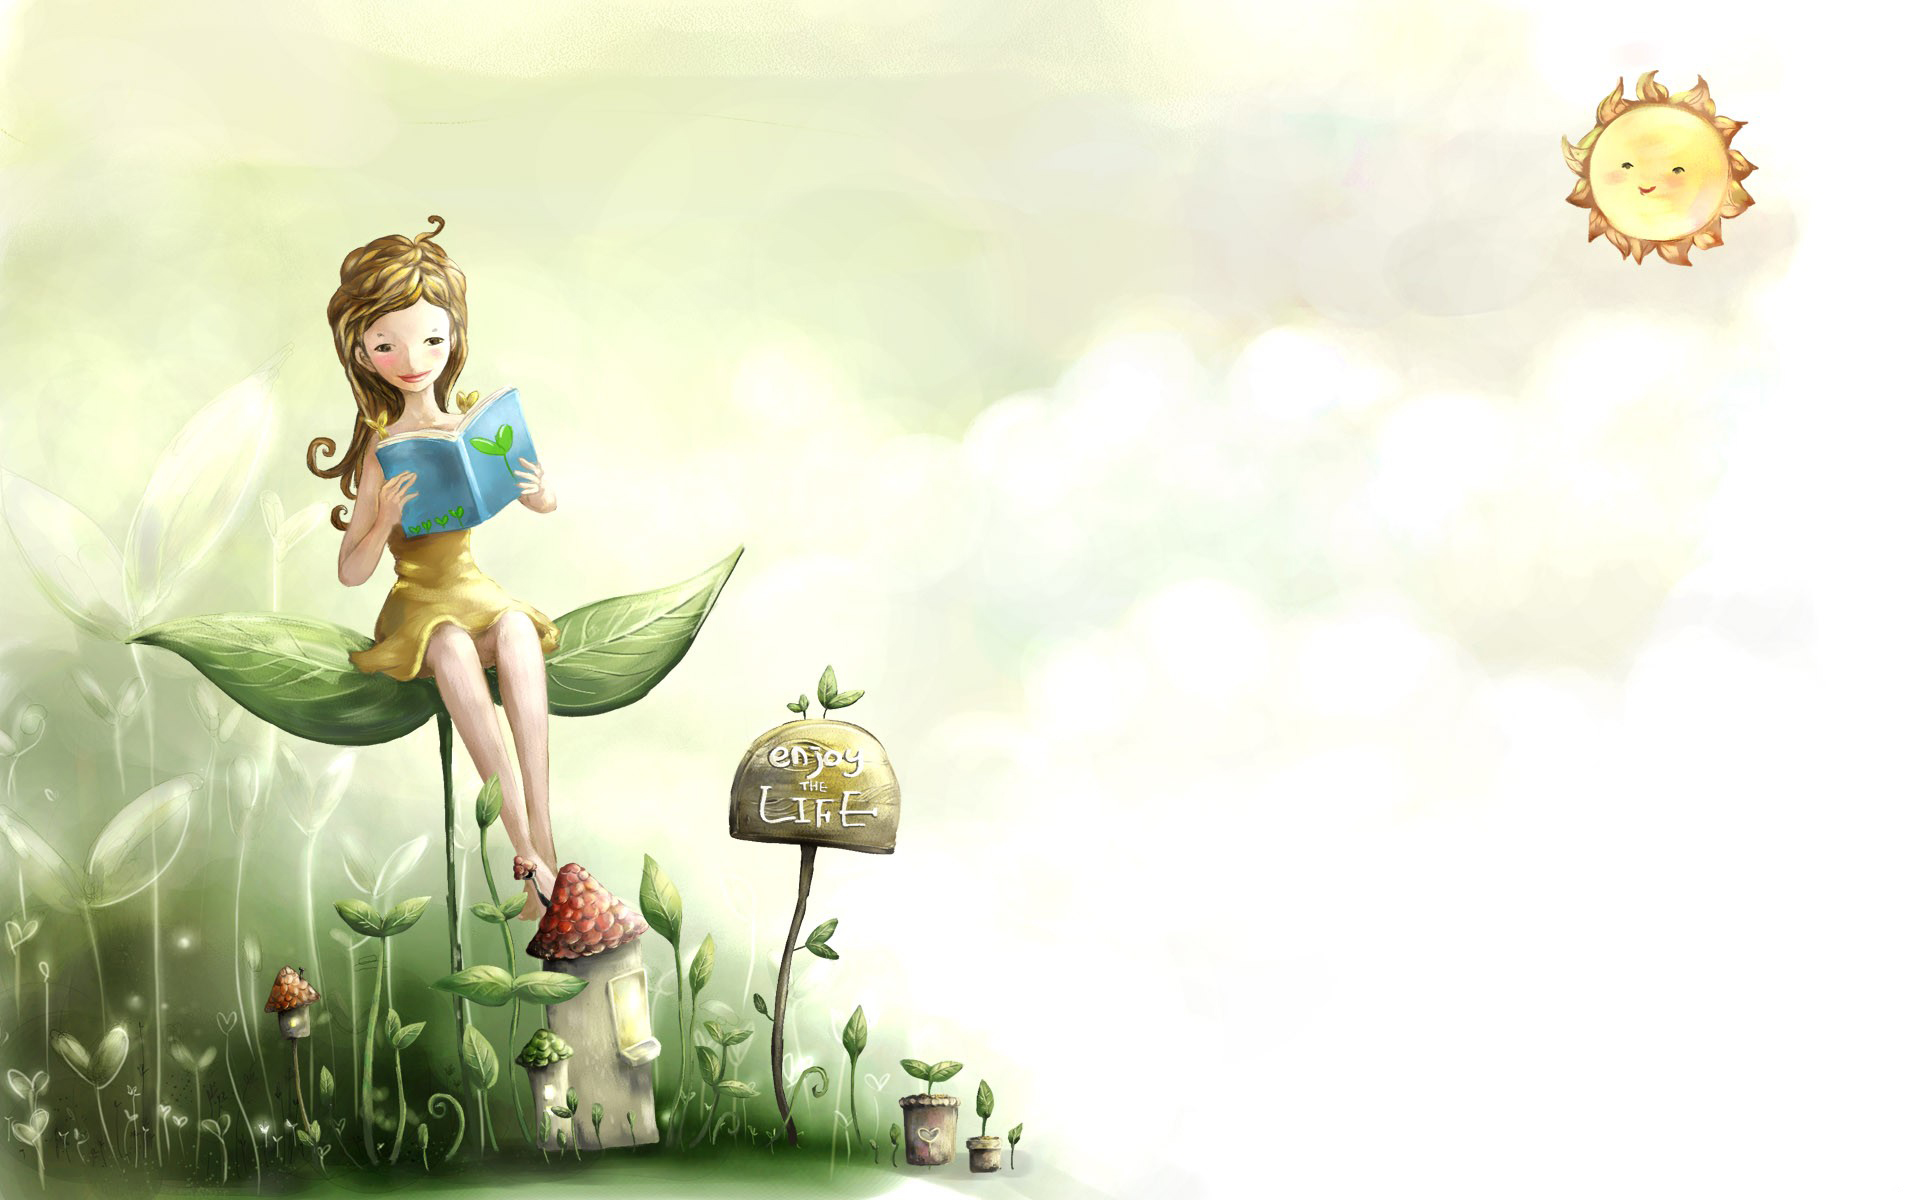 Free 3d Dinosaur Wallpaper Cute Cartoon Backgrounds Free Download Pixelstalk Net